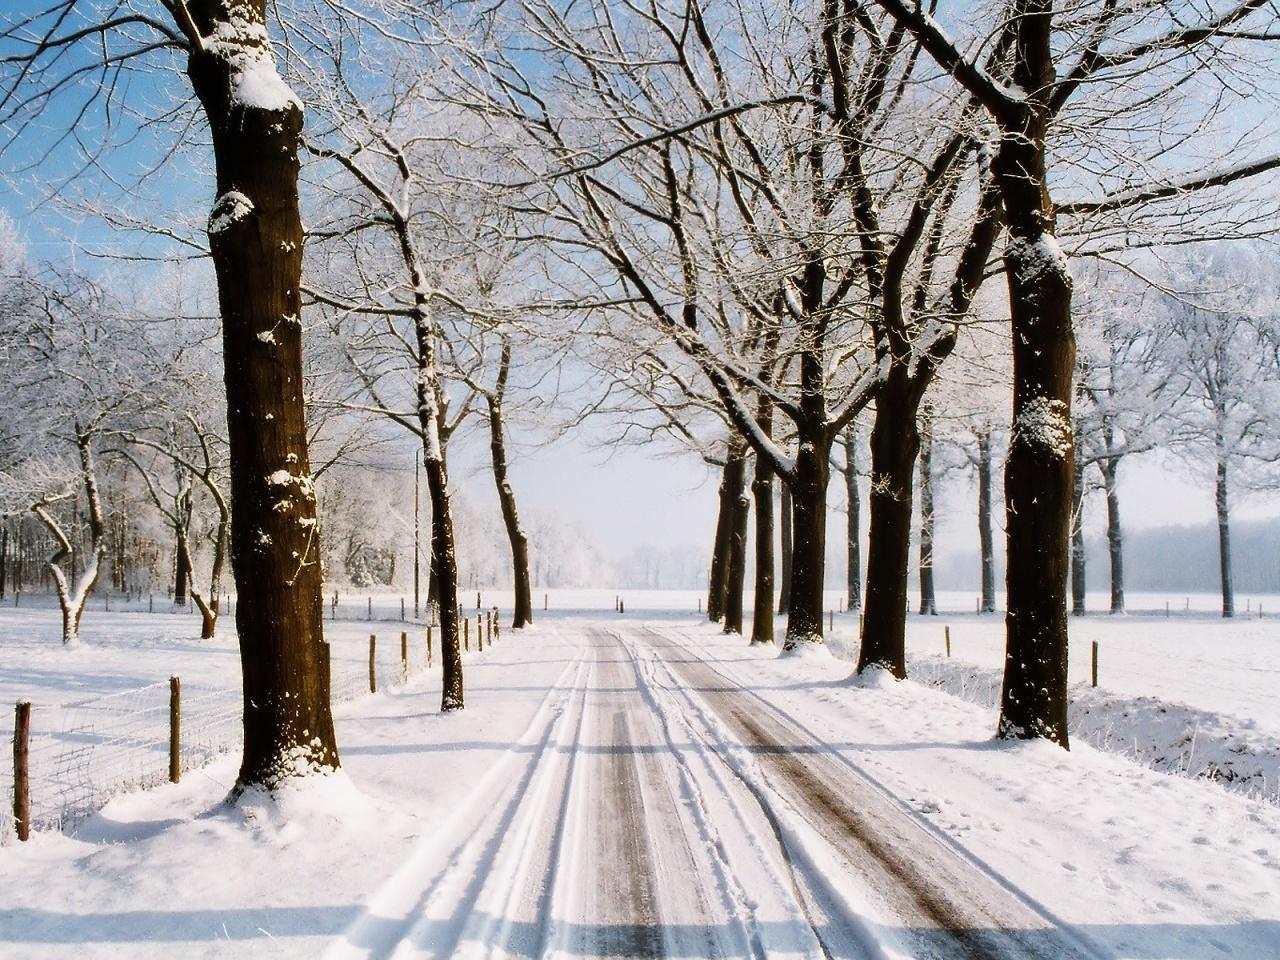 1280x960 Winter country road desktop PC and Mac wallpaper 1280x960